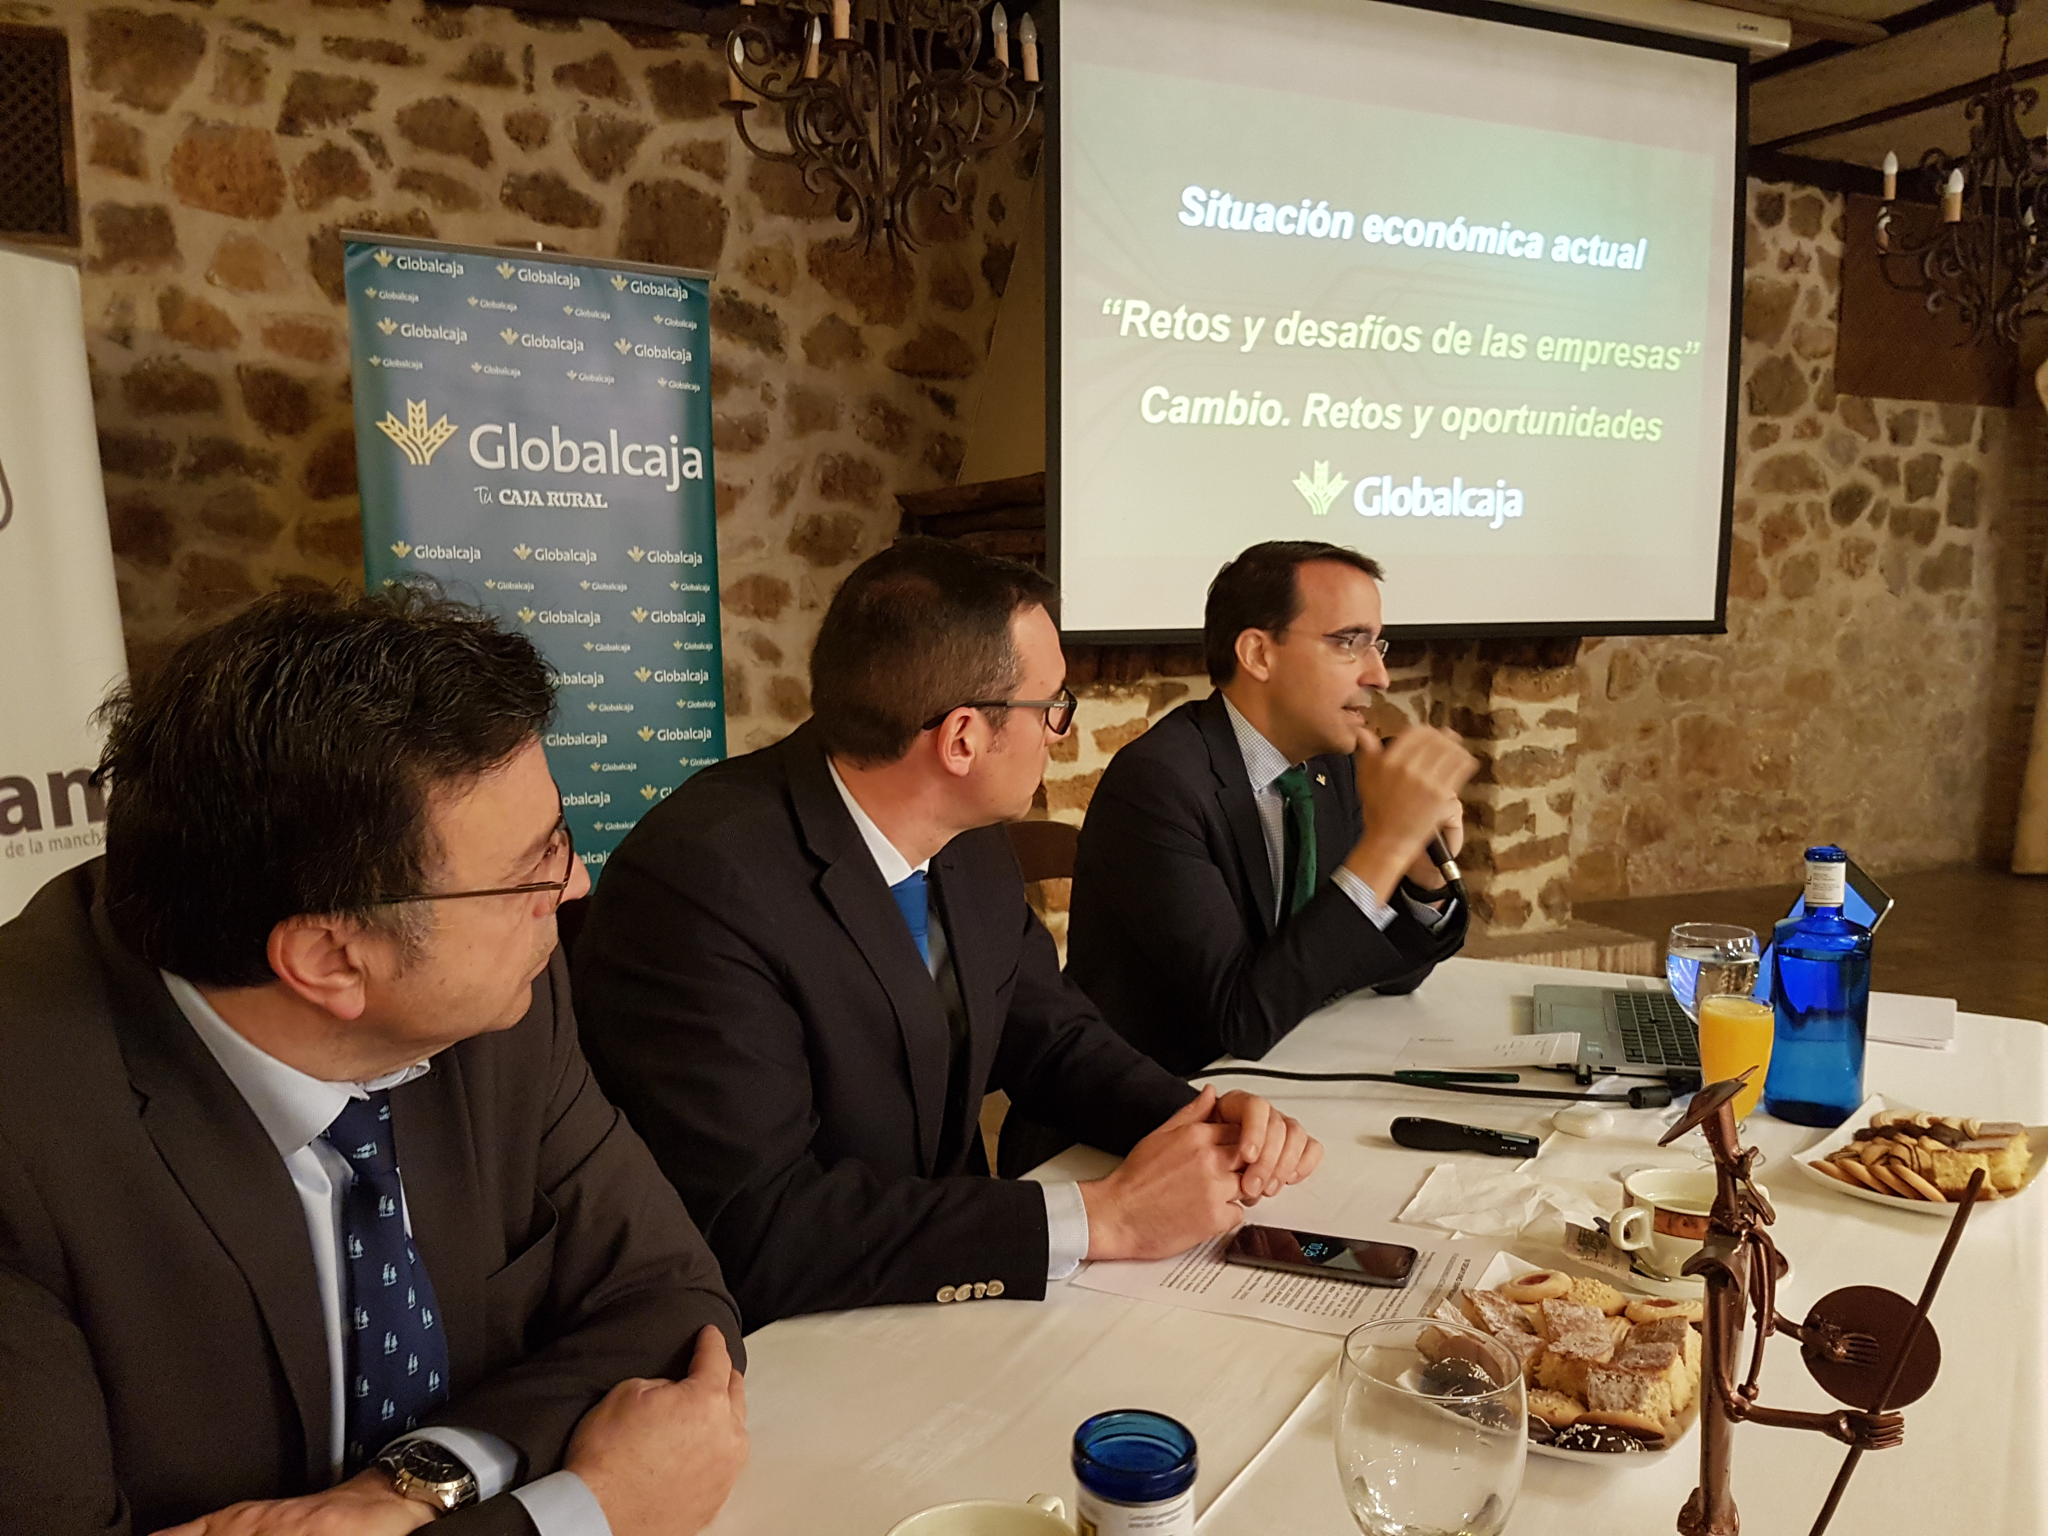 https://blog.globalcaja.es/wp-content/uploads/2018/04/Pedro-Palacios-en-UNECAMAN.jpg